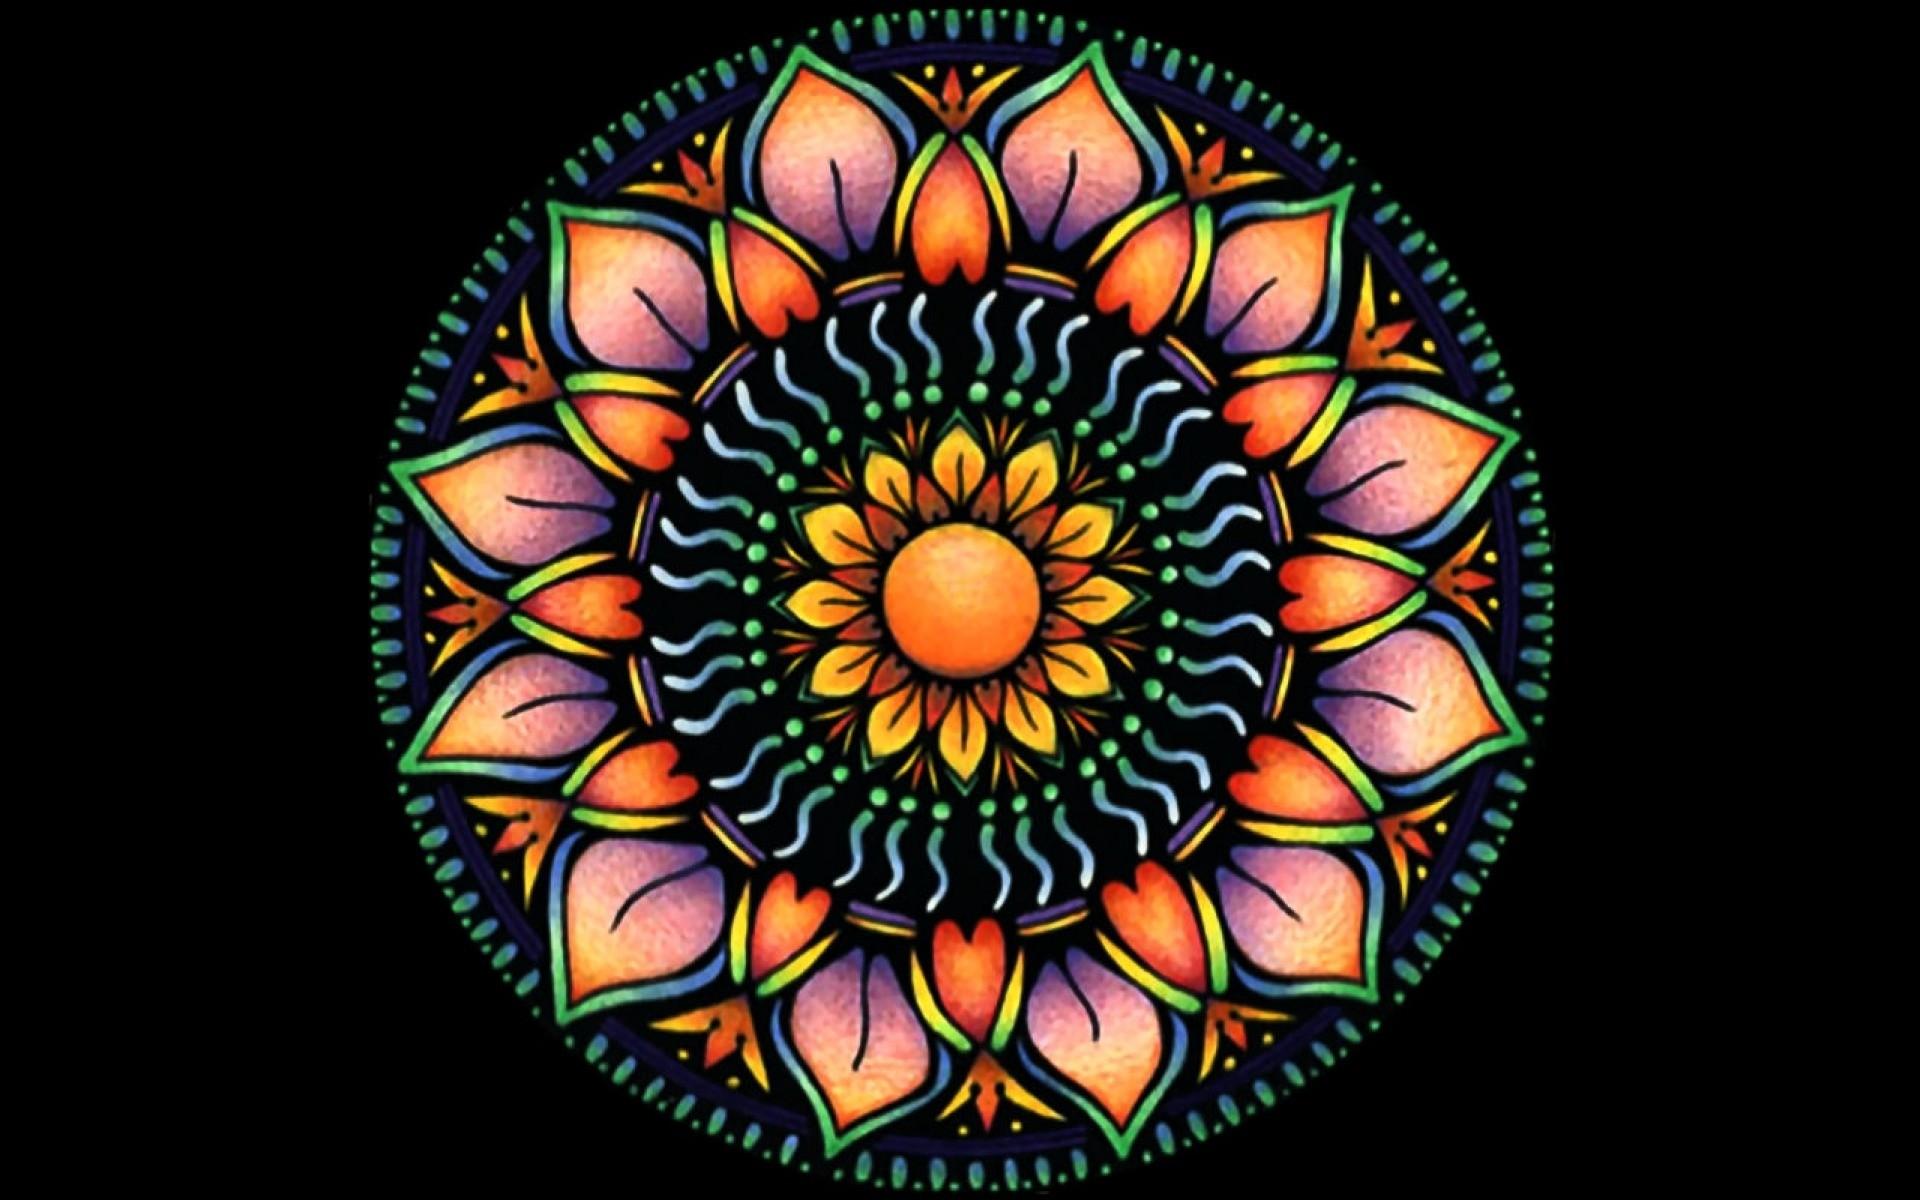 Orange Mandala Flower wallpapers | Orange Mandala Flower .